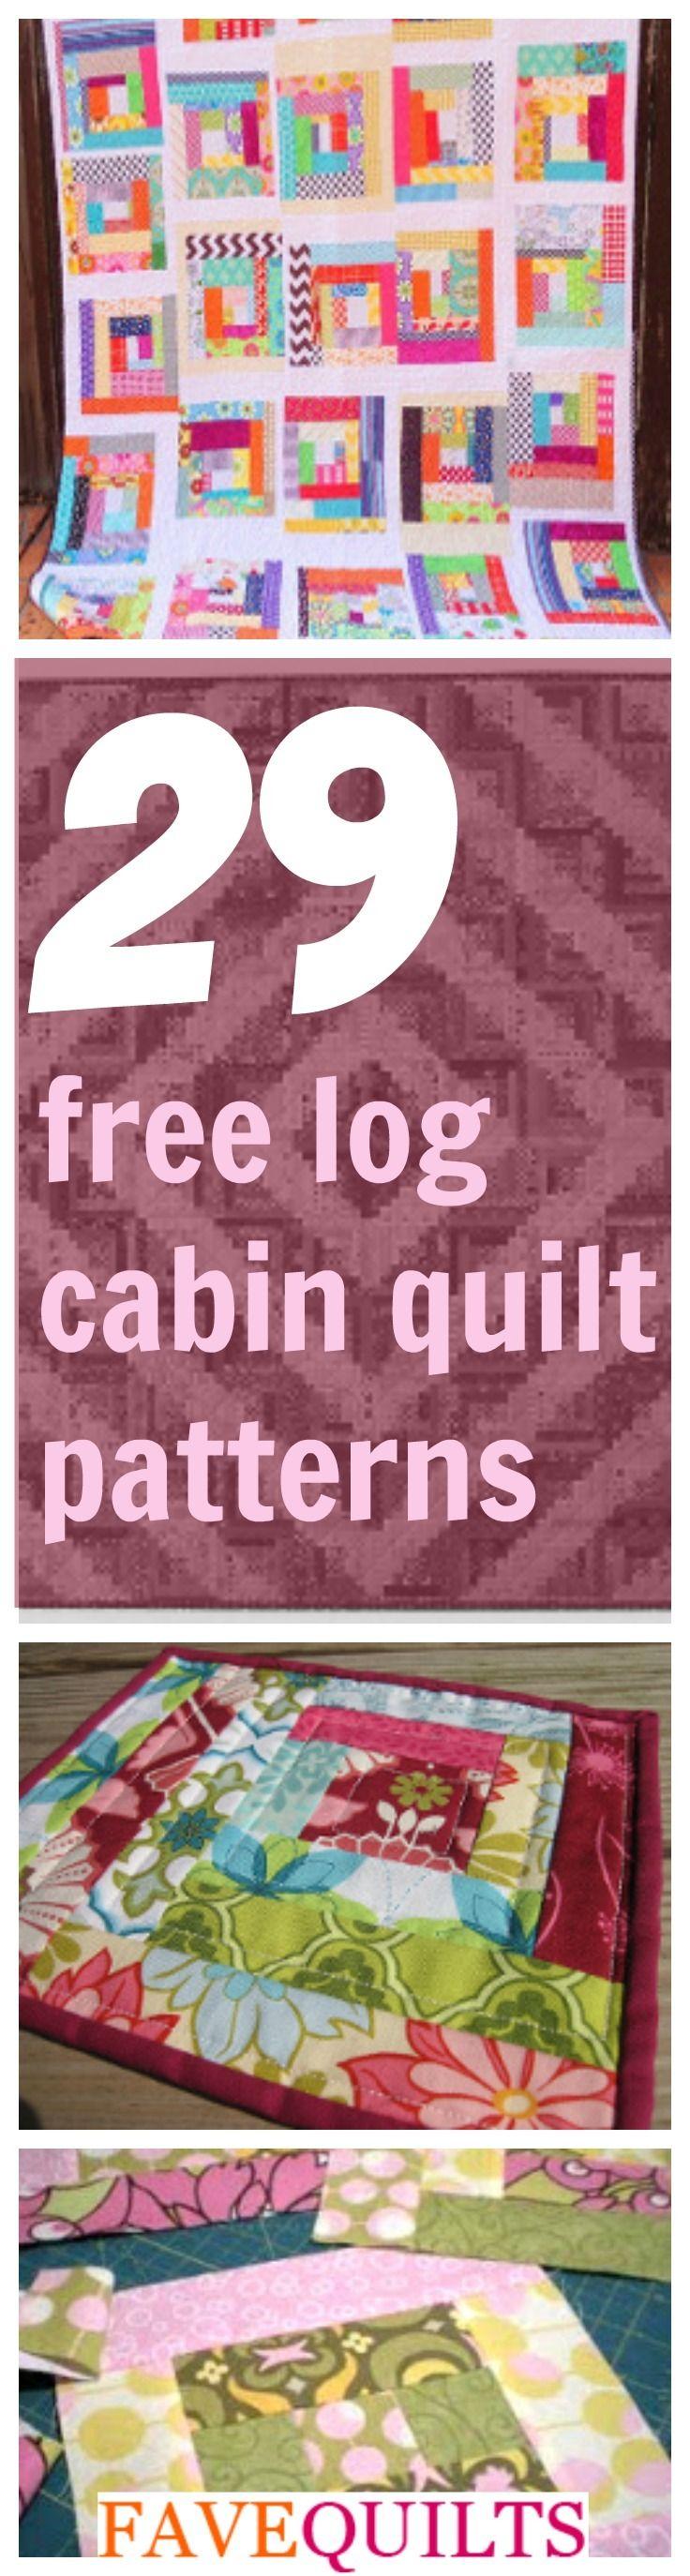 29 Free Log Cabin Quilt Patterns